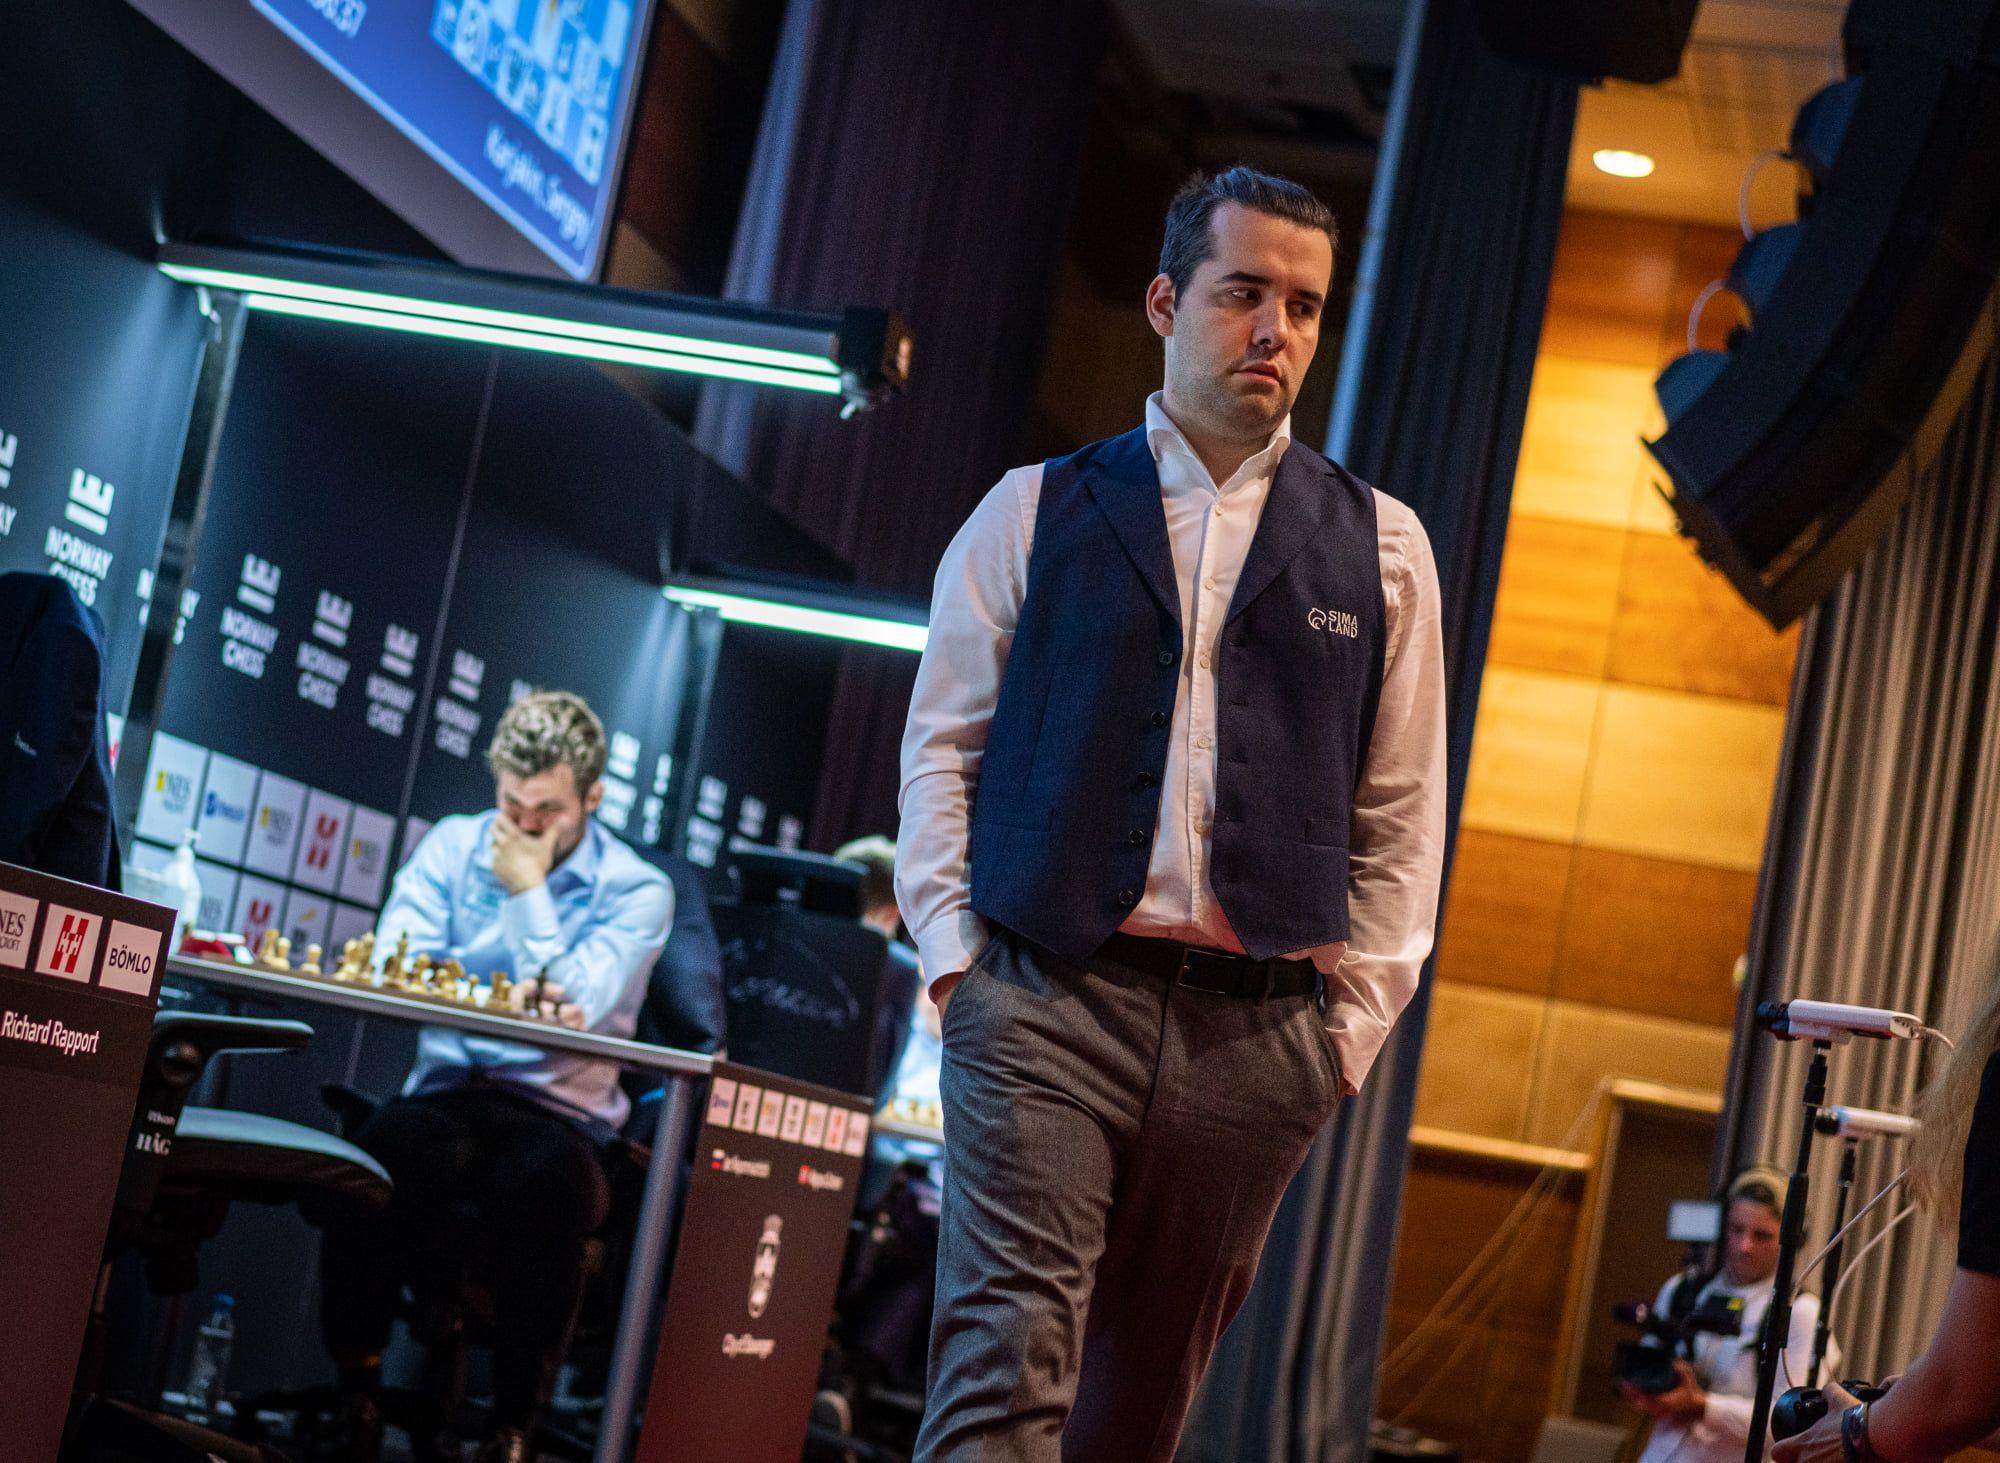 Carlsen Nepomniachtchi 2021 Norway Chess